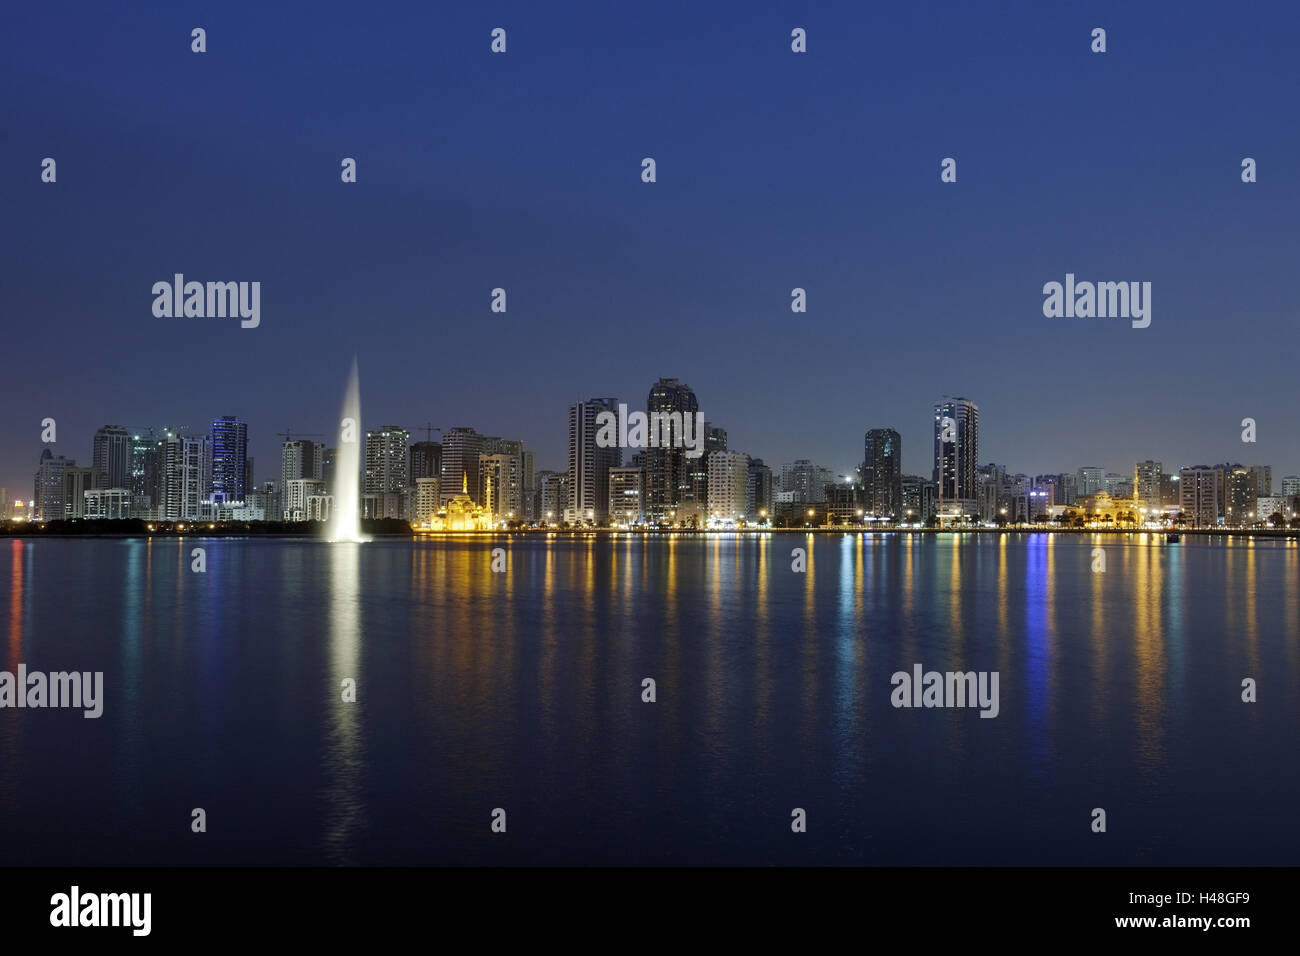 Skyline, Corniche Street, Golden Mile, emirate Sharjah, United Arab Emirates, Arabian peninsula, the Middle East, - Stock Image